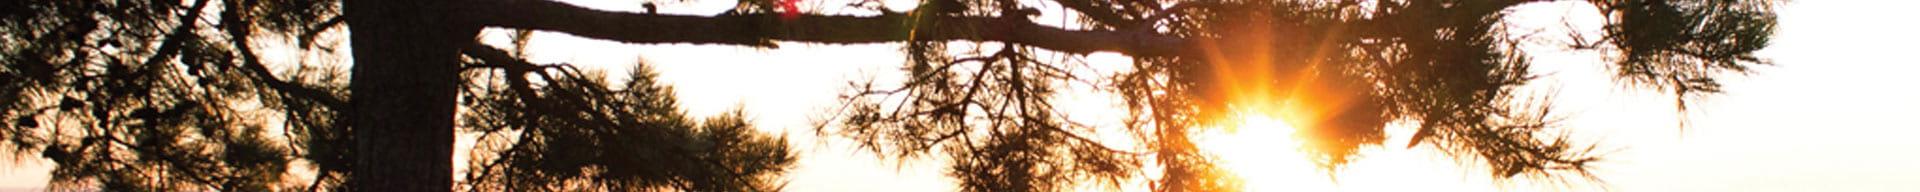 sun glaring through the dark trees